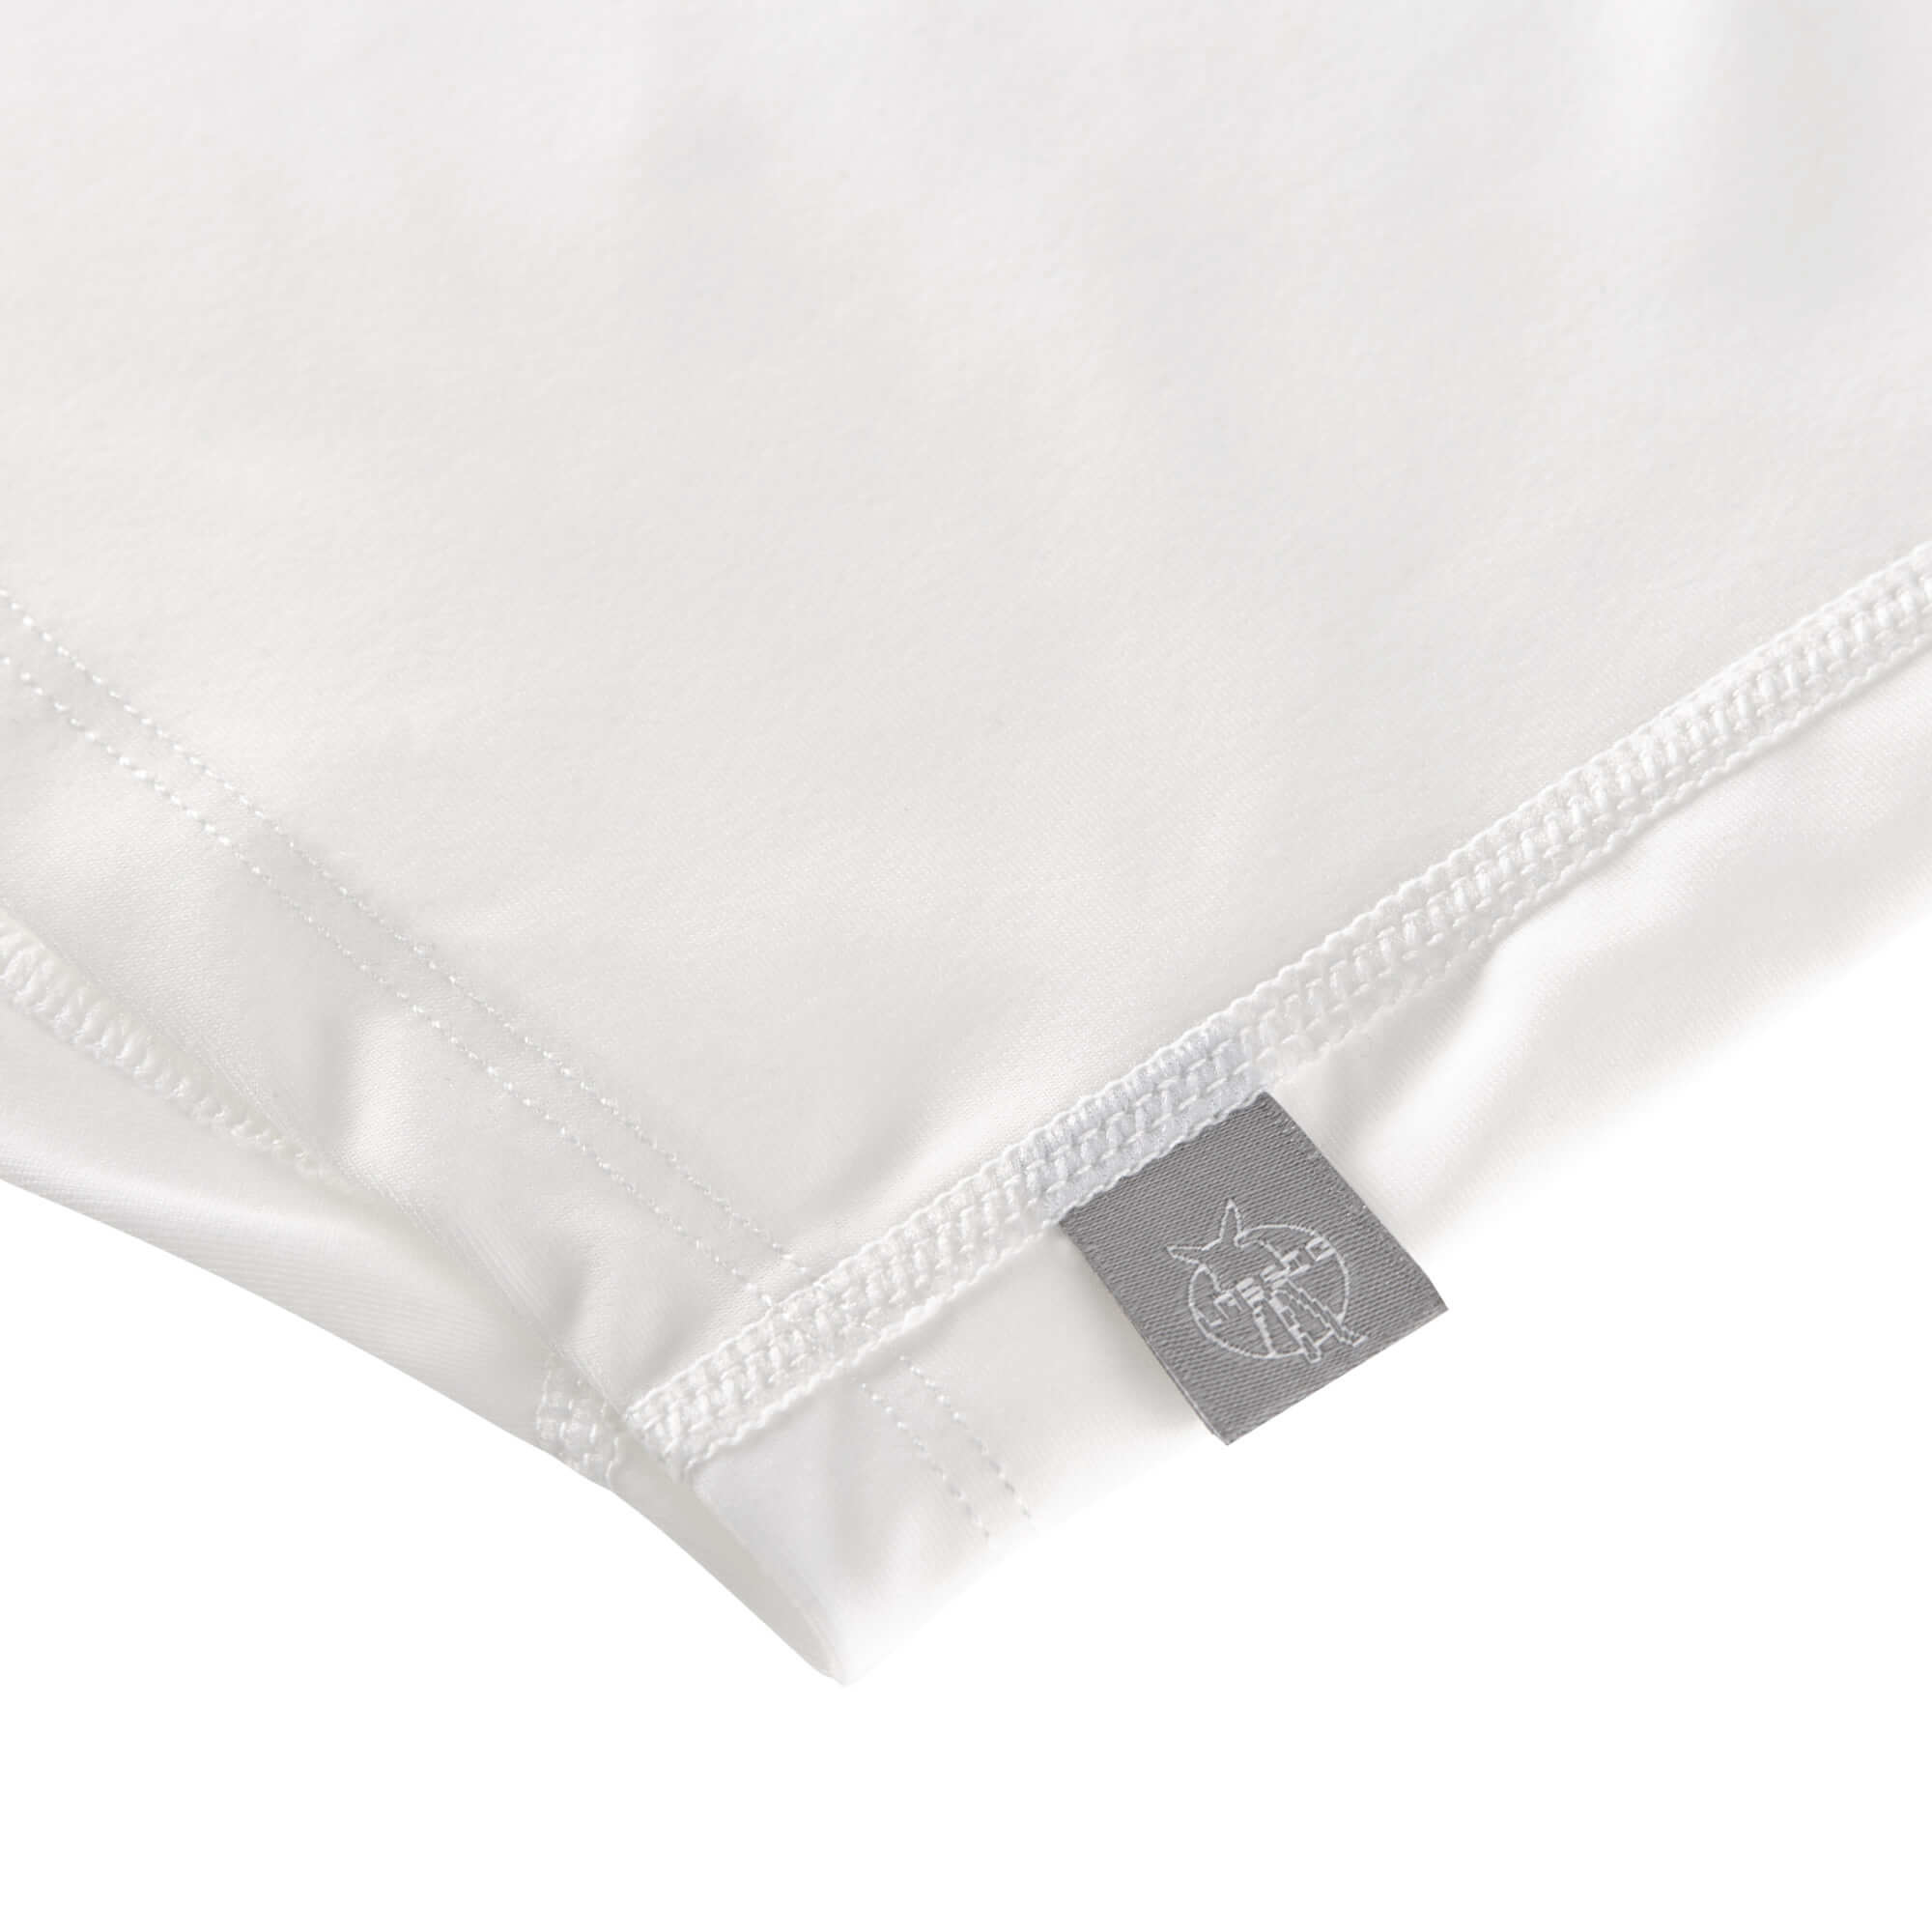 Lässig Lässig Splash & Fun Korte mouw Rashguard UV zwemshirt – Caravan white